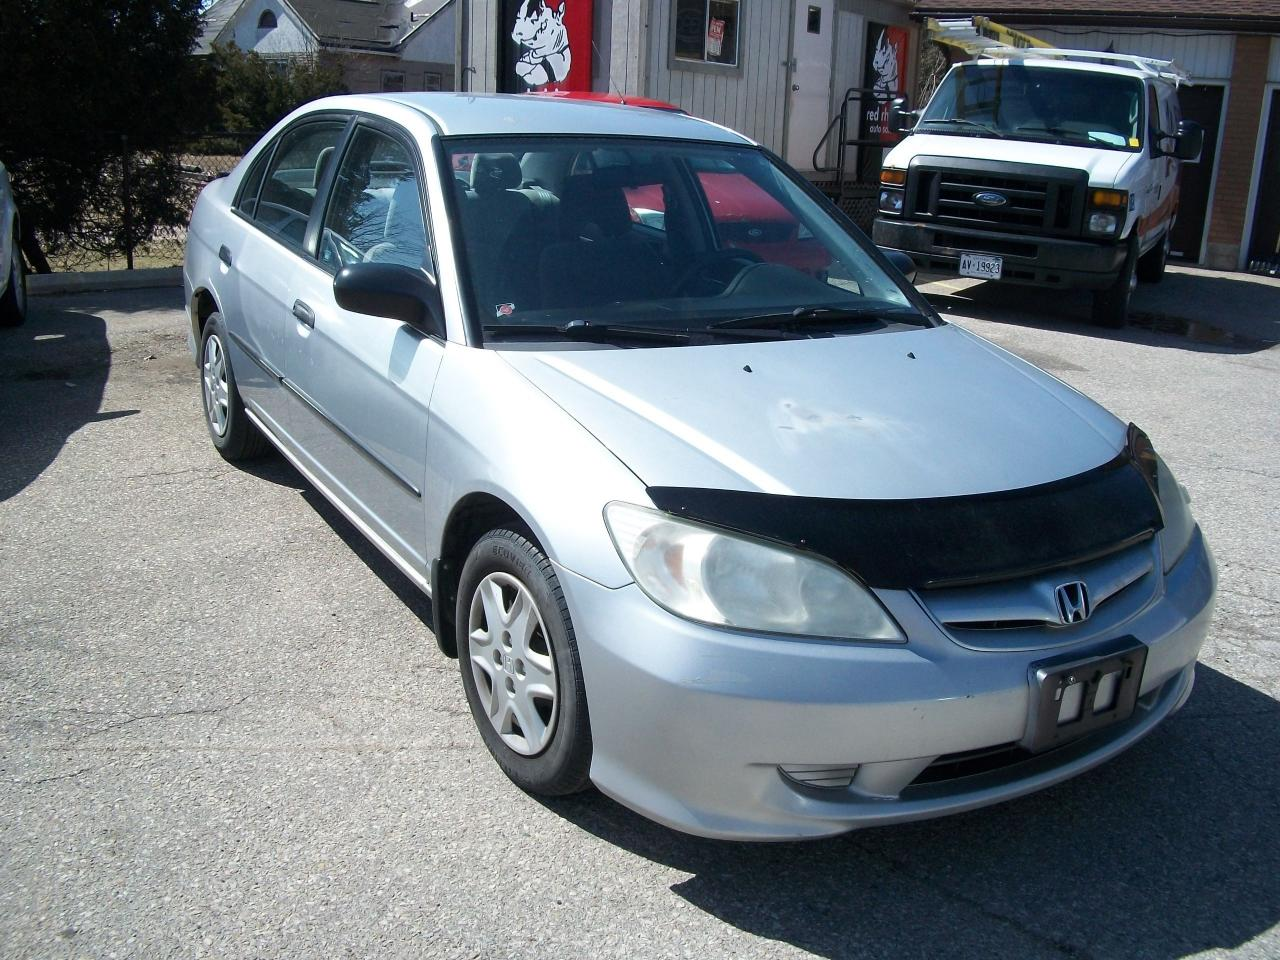 Used 2005 Honda Civic Dx For Sale In Cambridge Ontario